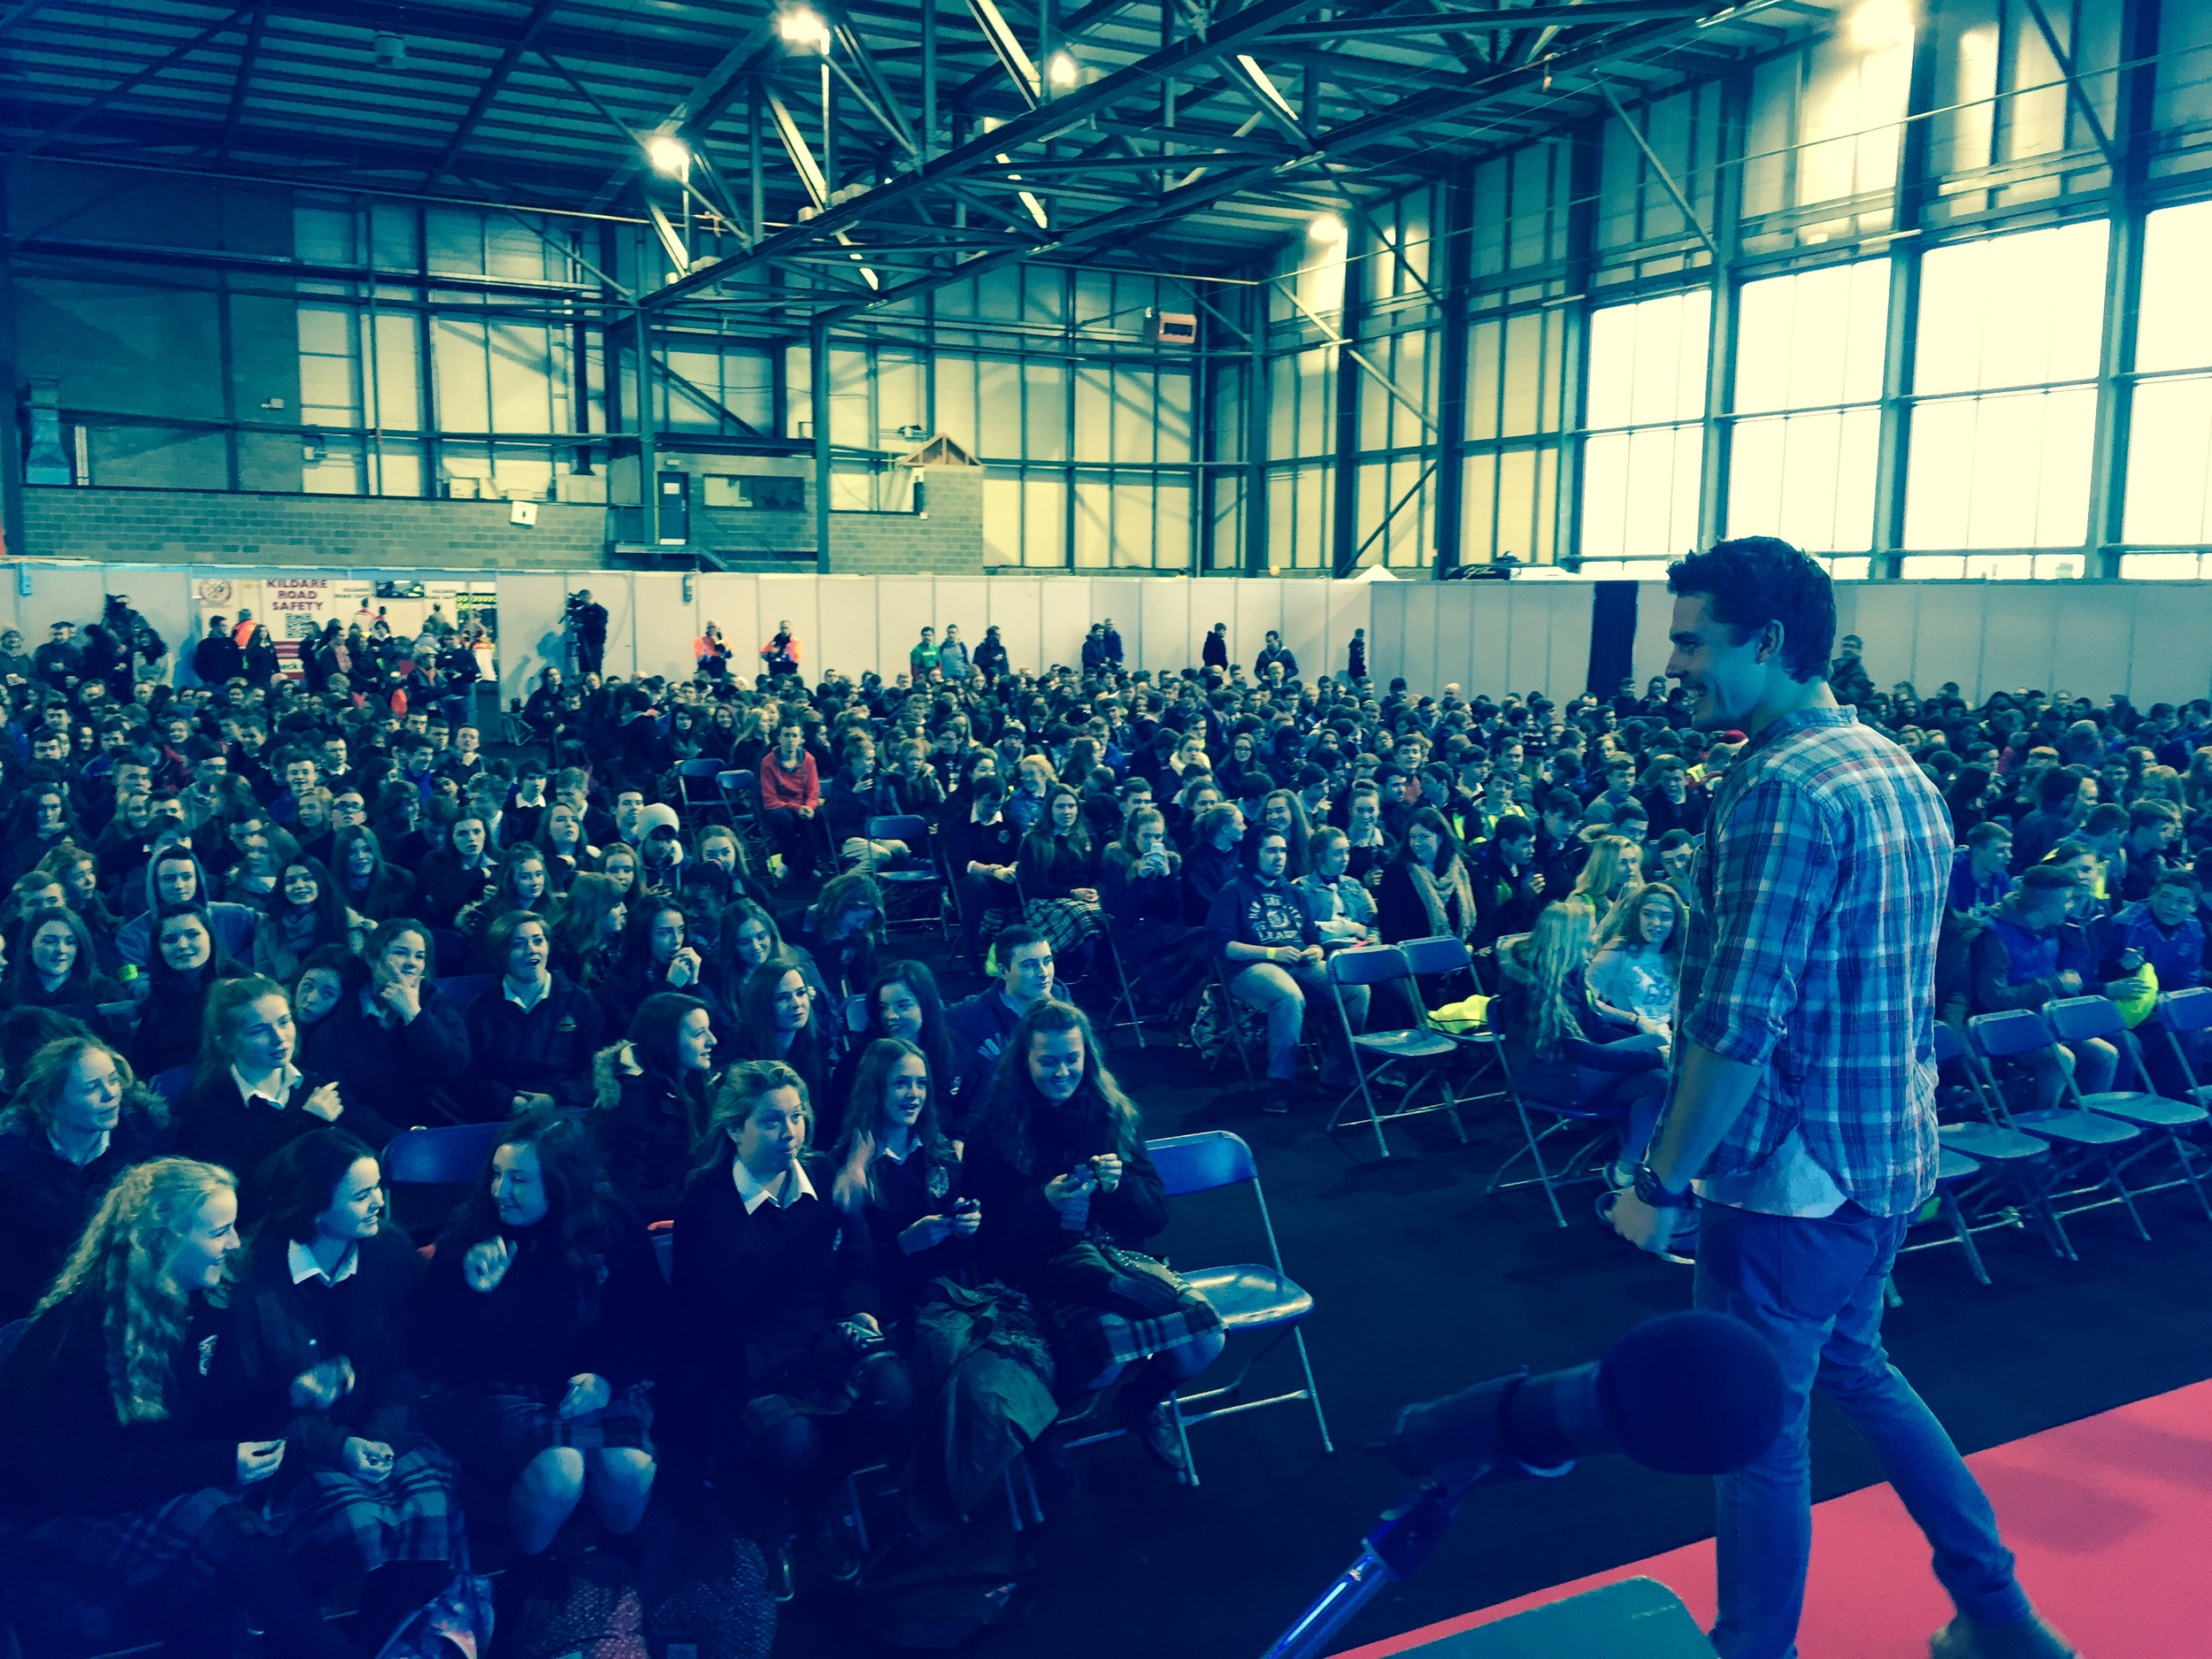 Andrew Morely schools presentation